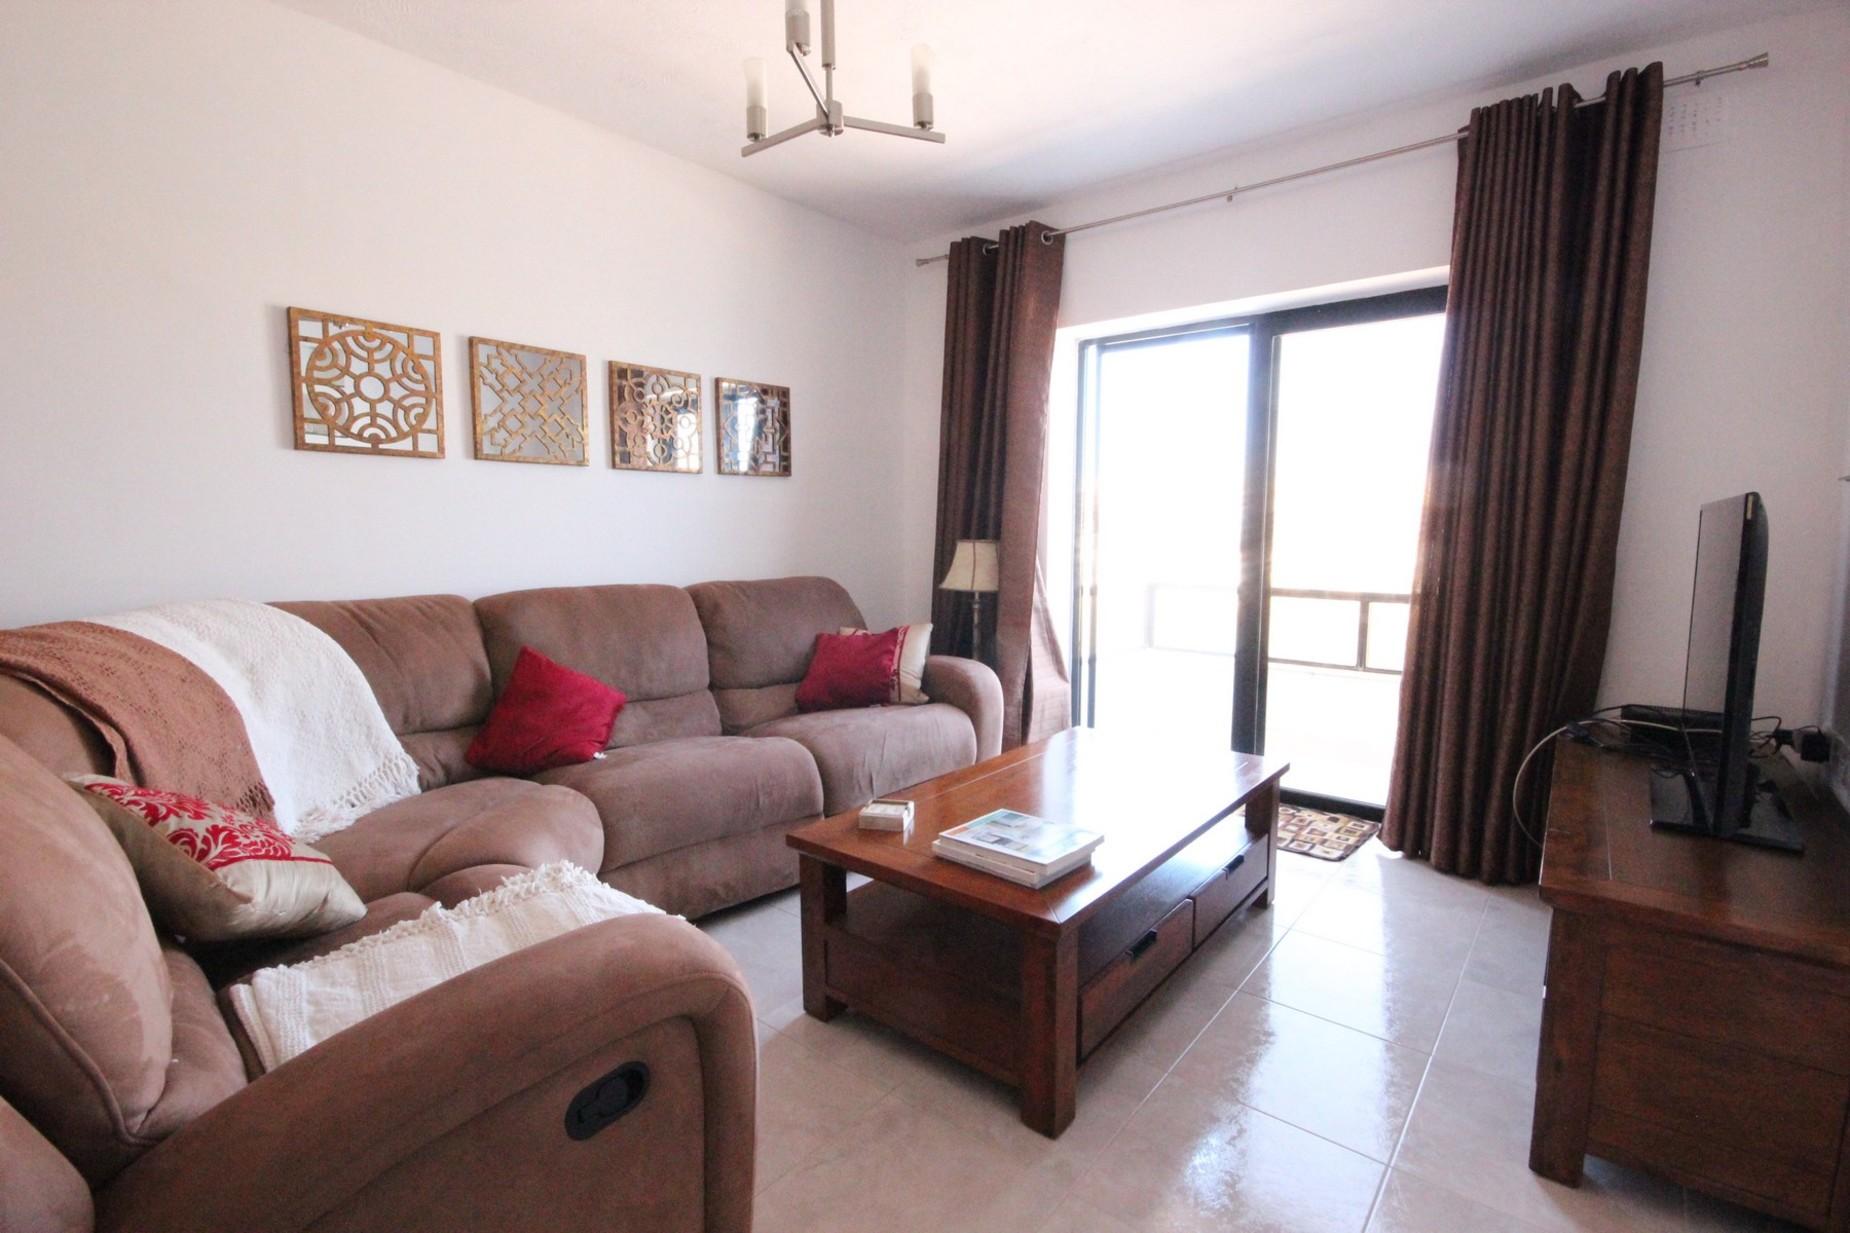 3 bed Apartment For Rent in Naxxar, Naxxar - thumb 2